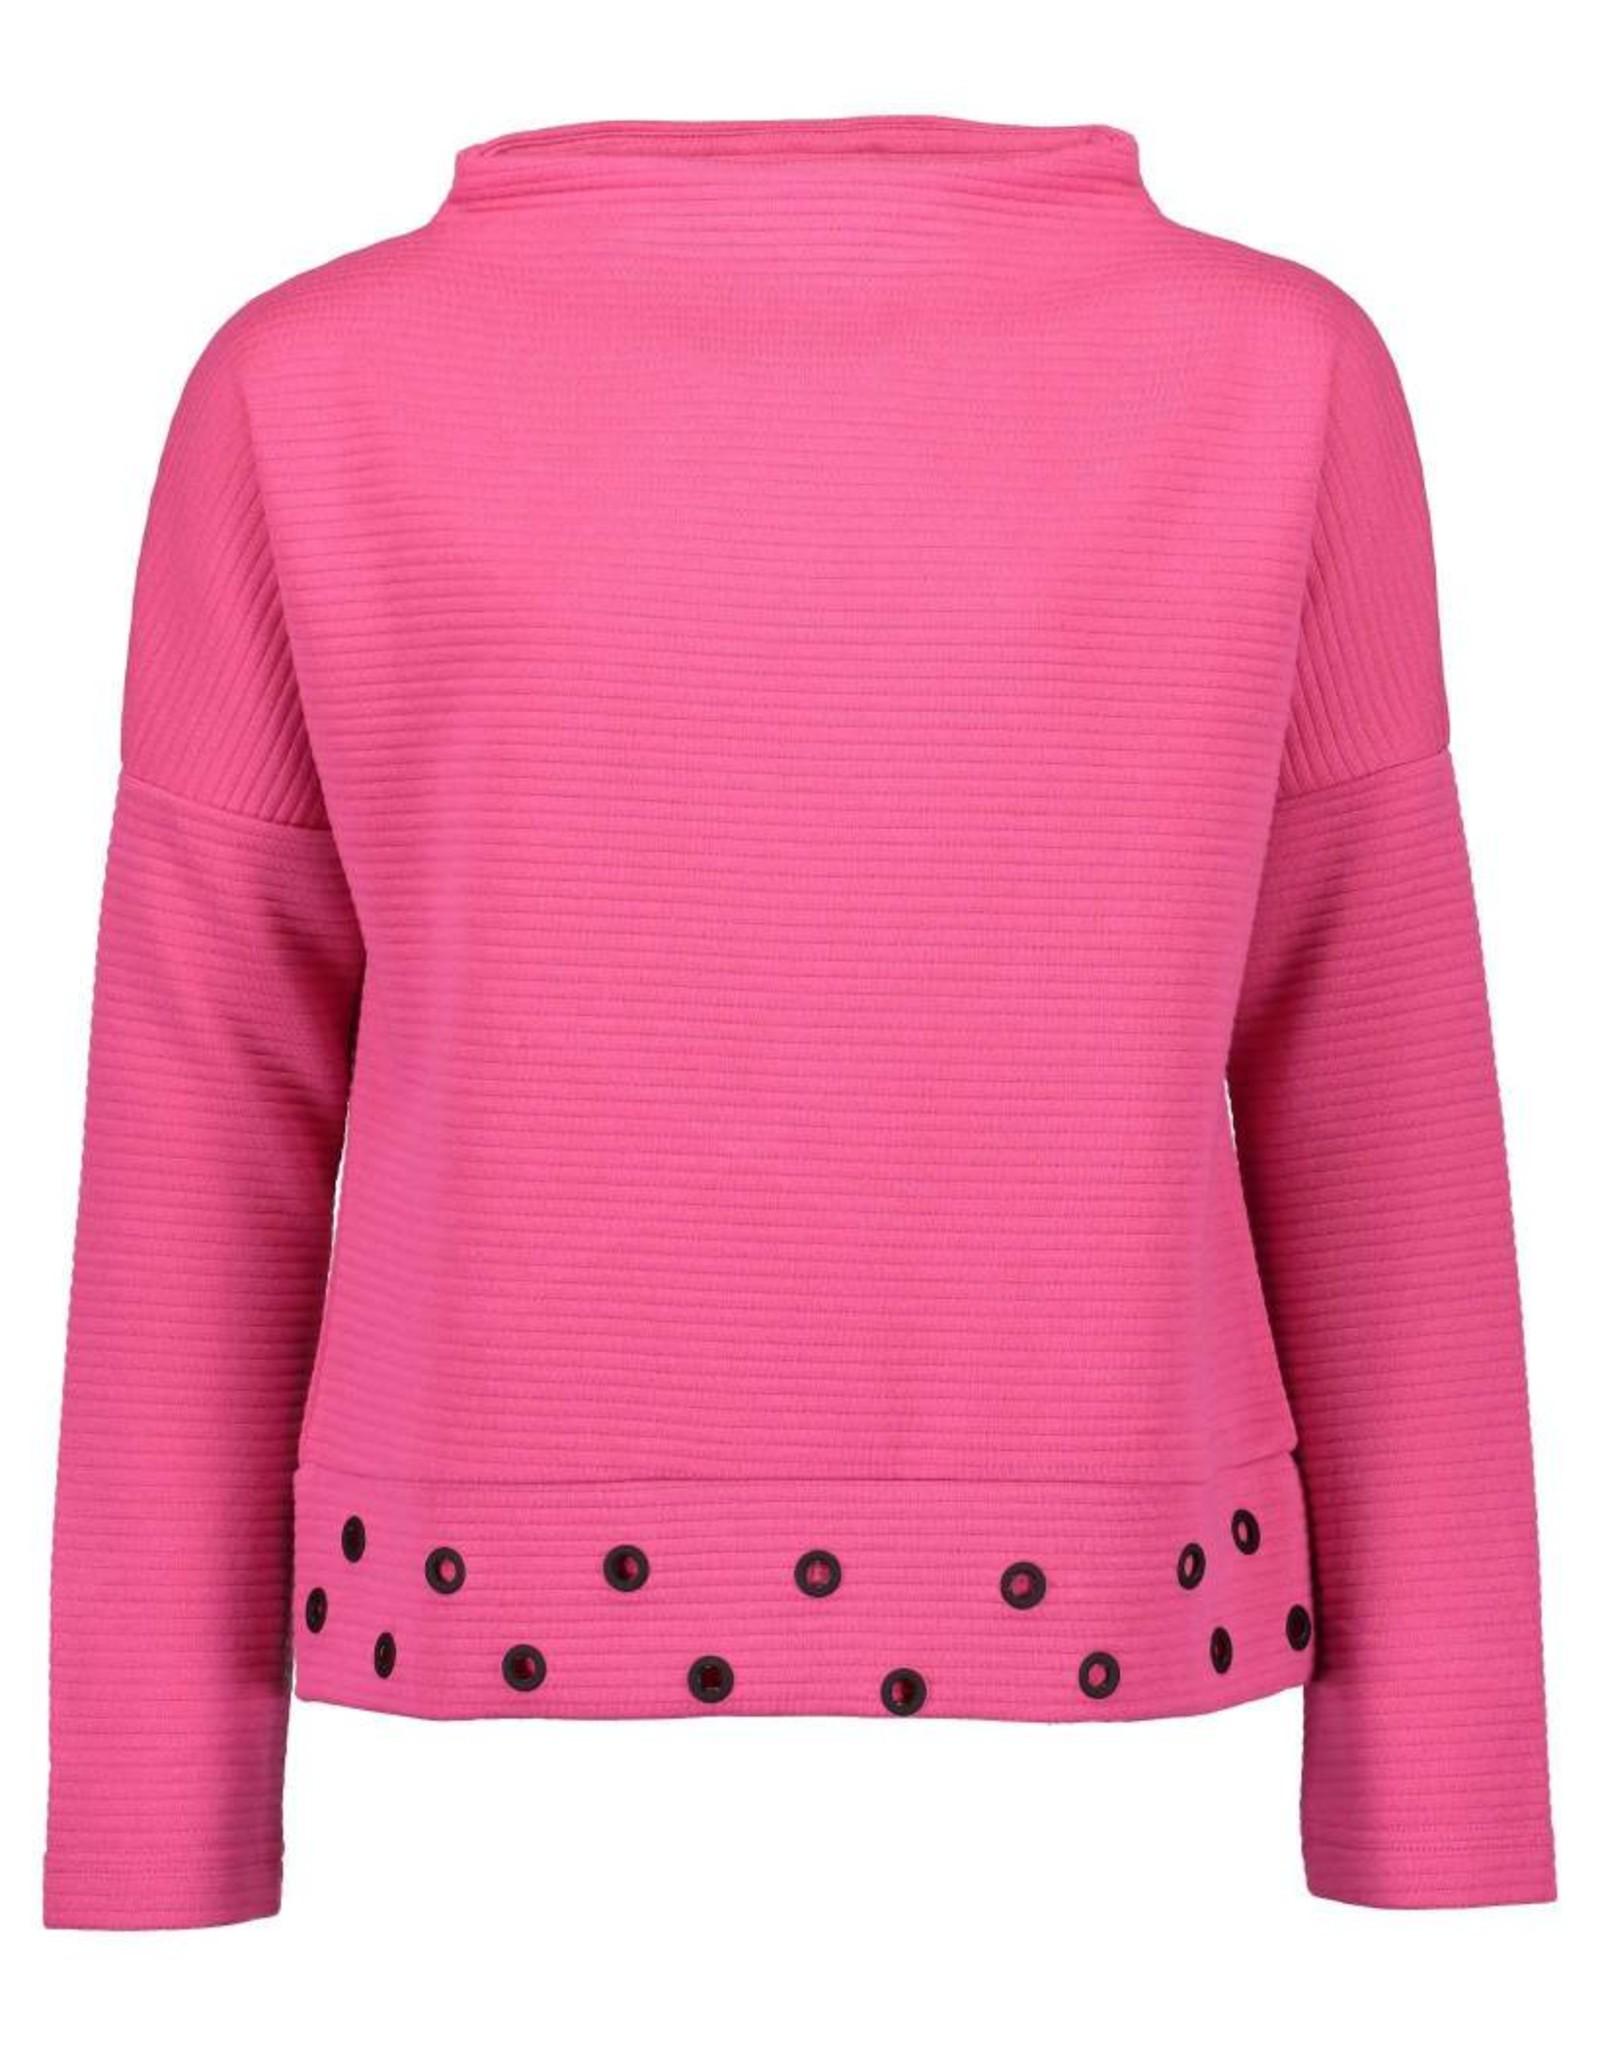 Blue Seven Blue Seven meiden trui met hoge kraag en drukkers Pink